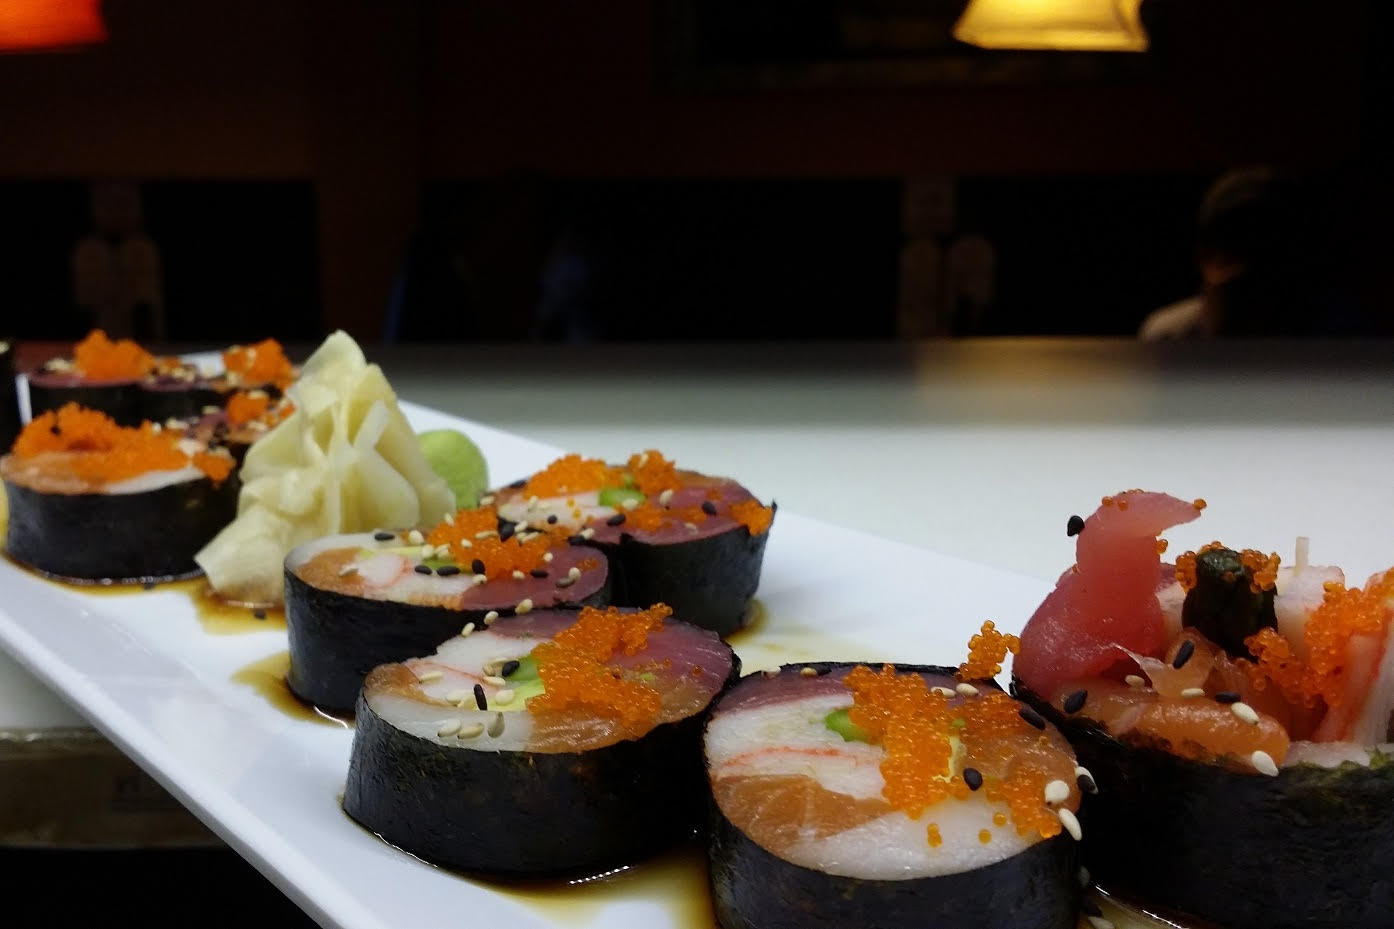 Sweet Dream Roll - Tuna, Salmon, Escolar, Krab, Masago, Asparagus, Avocado and served with Ponzu Sauce (no Rice).